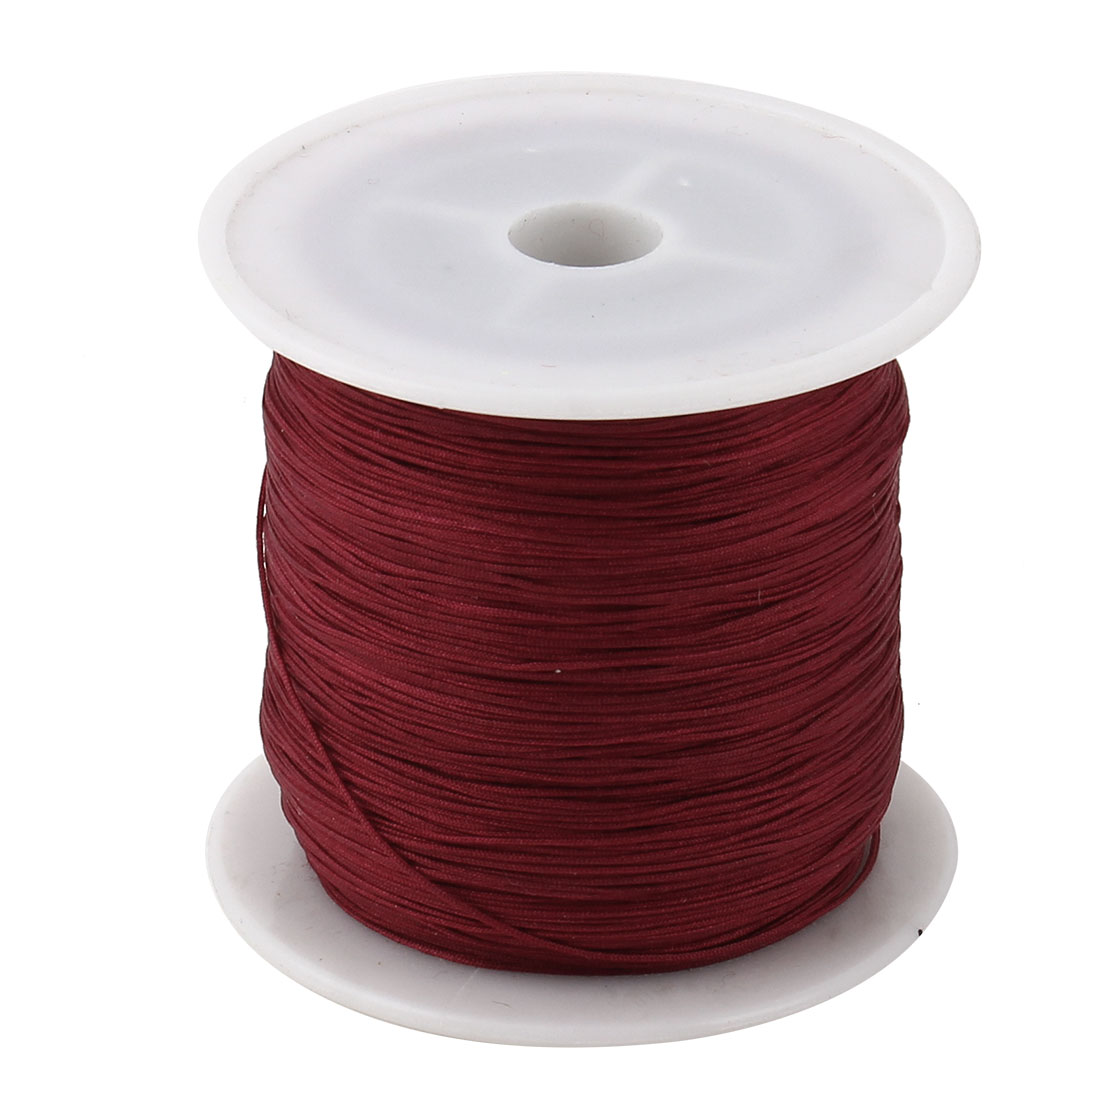 Household Nylon DIY Art Craft Chinese Knot Cord String Rope Burgundy 153 Yards